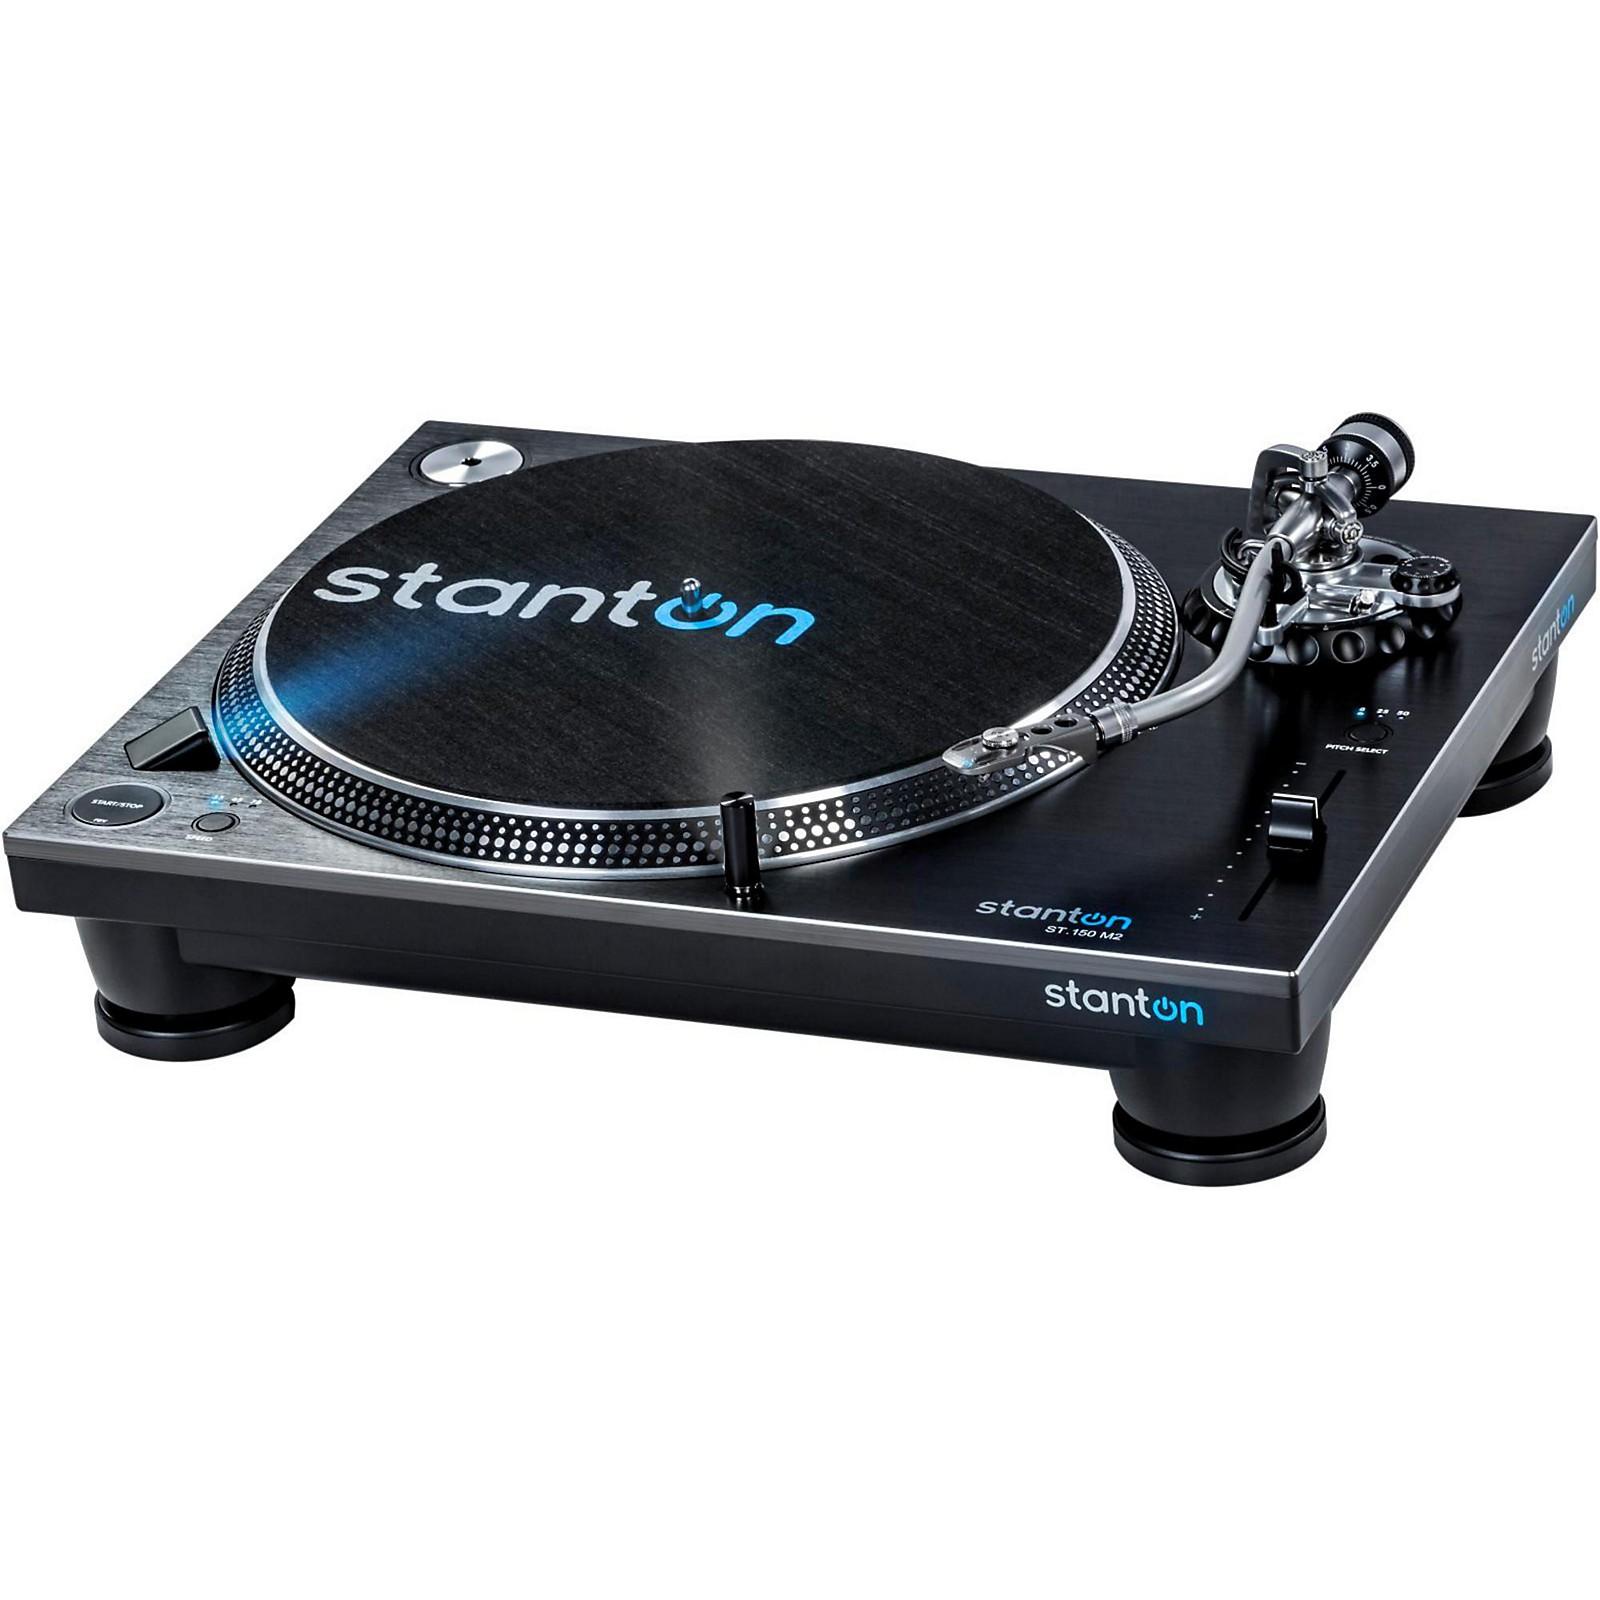 Open Box Stanton ST.150 M2 High-Torque Professional Direct-Drive DJ Turntable with Deckadance